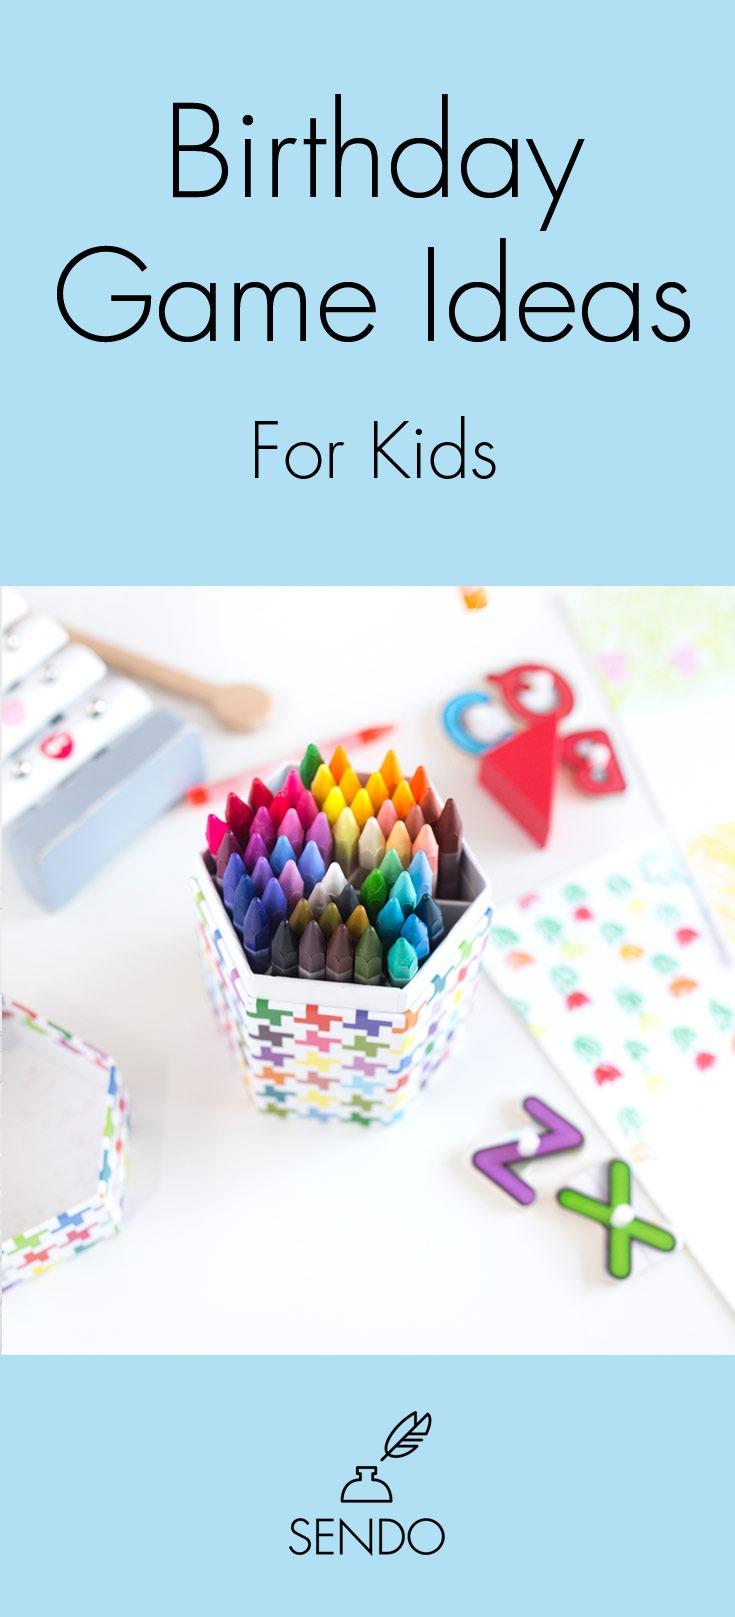 Birthday Game Ideas for Kids #kidsparty #birthdaygames #kidsbirthdayparty